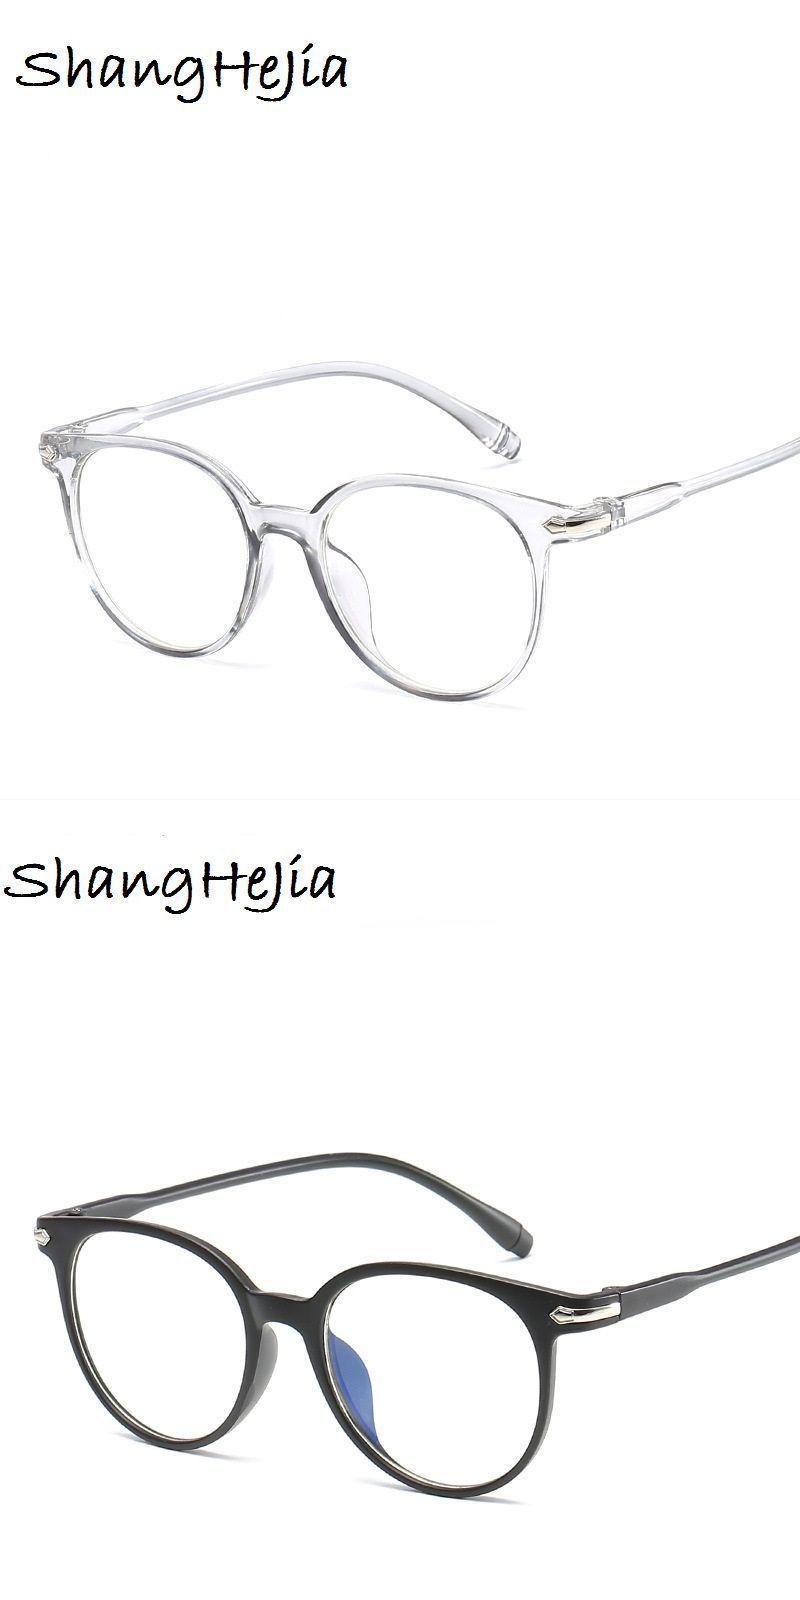 26255b8a6 2018 fashion women glasses frame men eyeglasses frame vintage round clear  lens glasses optical spectacle frame #plastic #titanium #women #solid # frames ...